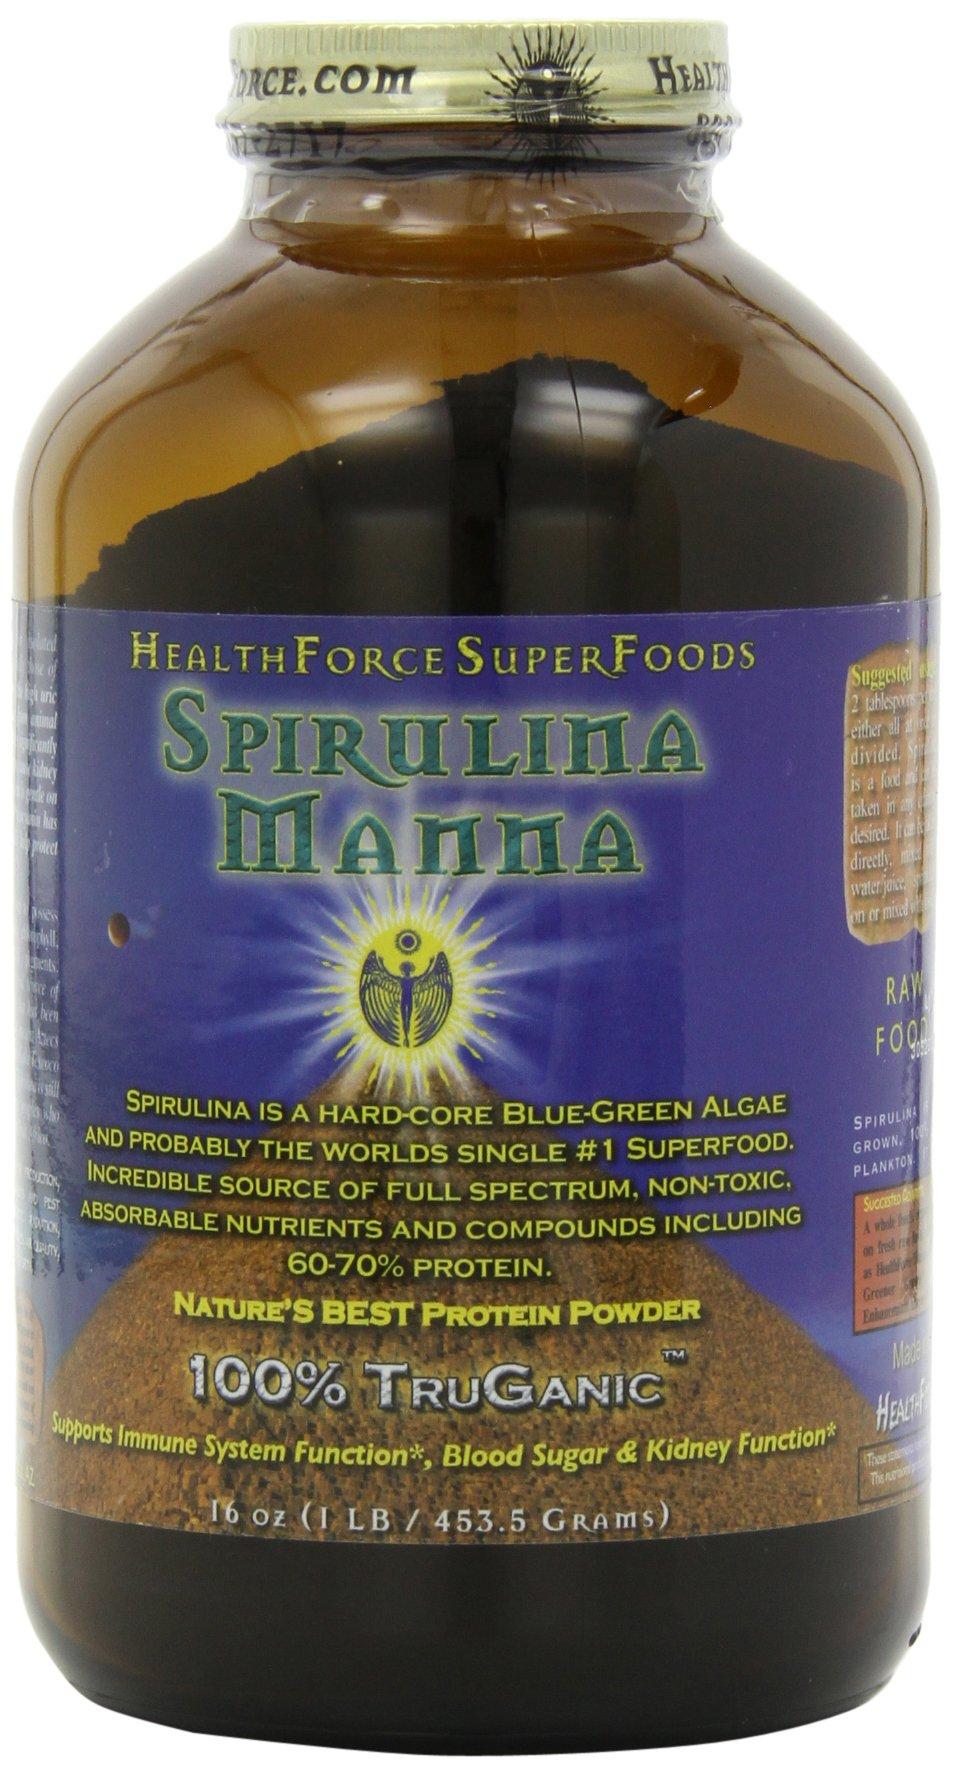 HealthForce SuperFoods Spirulina Manna 16 Ounces Powder